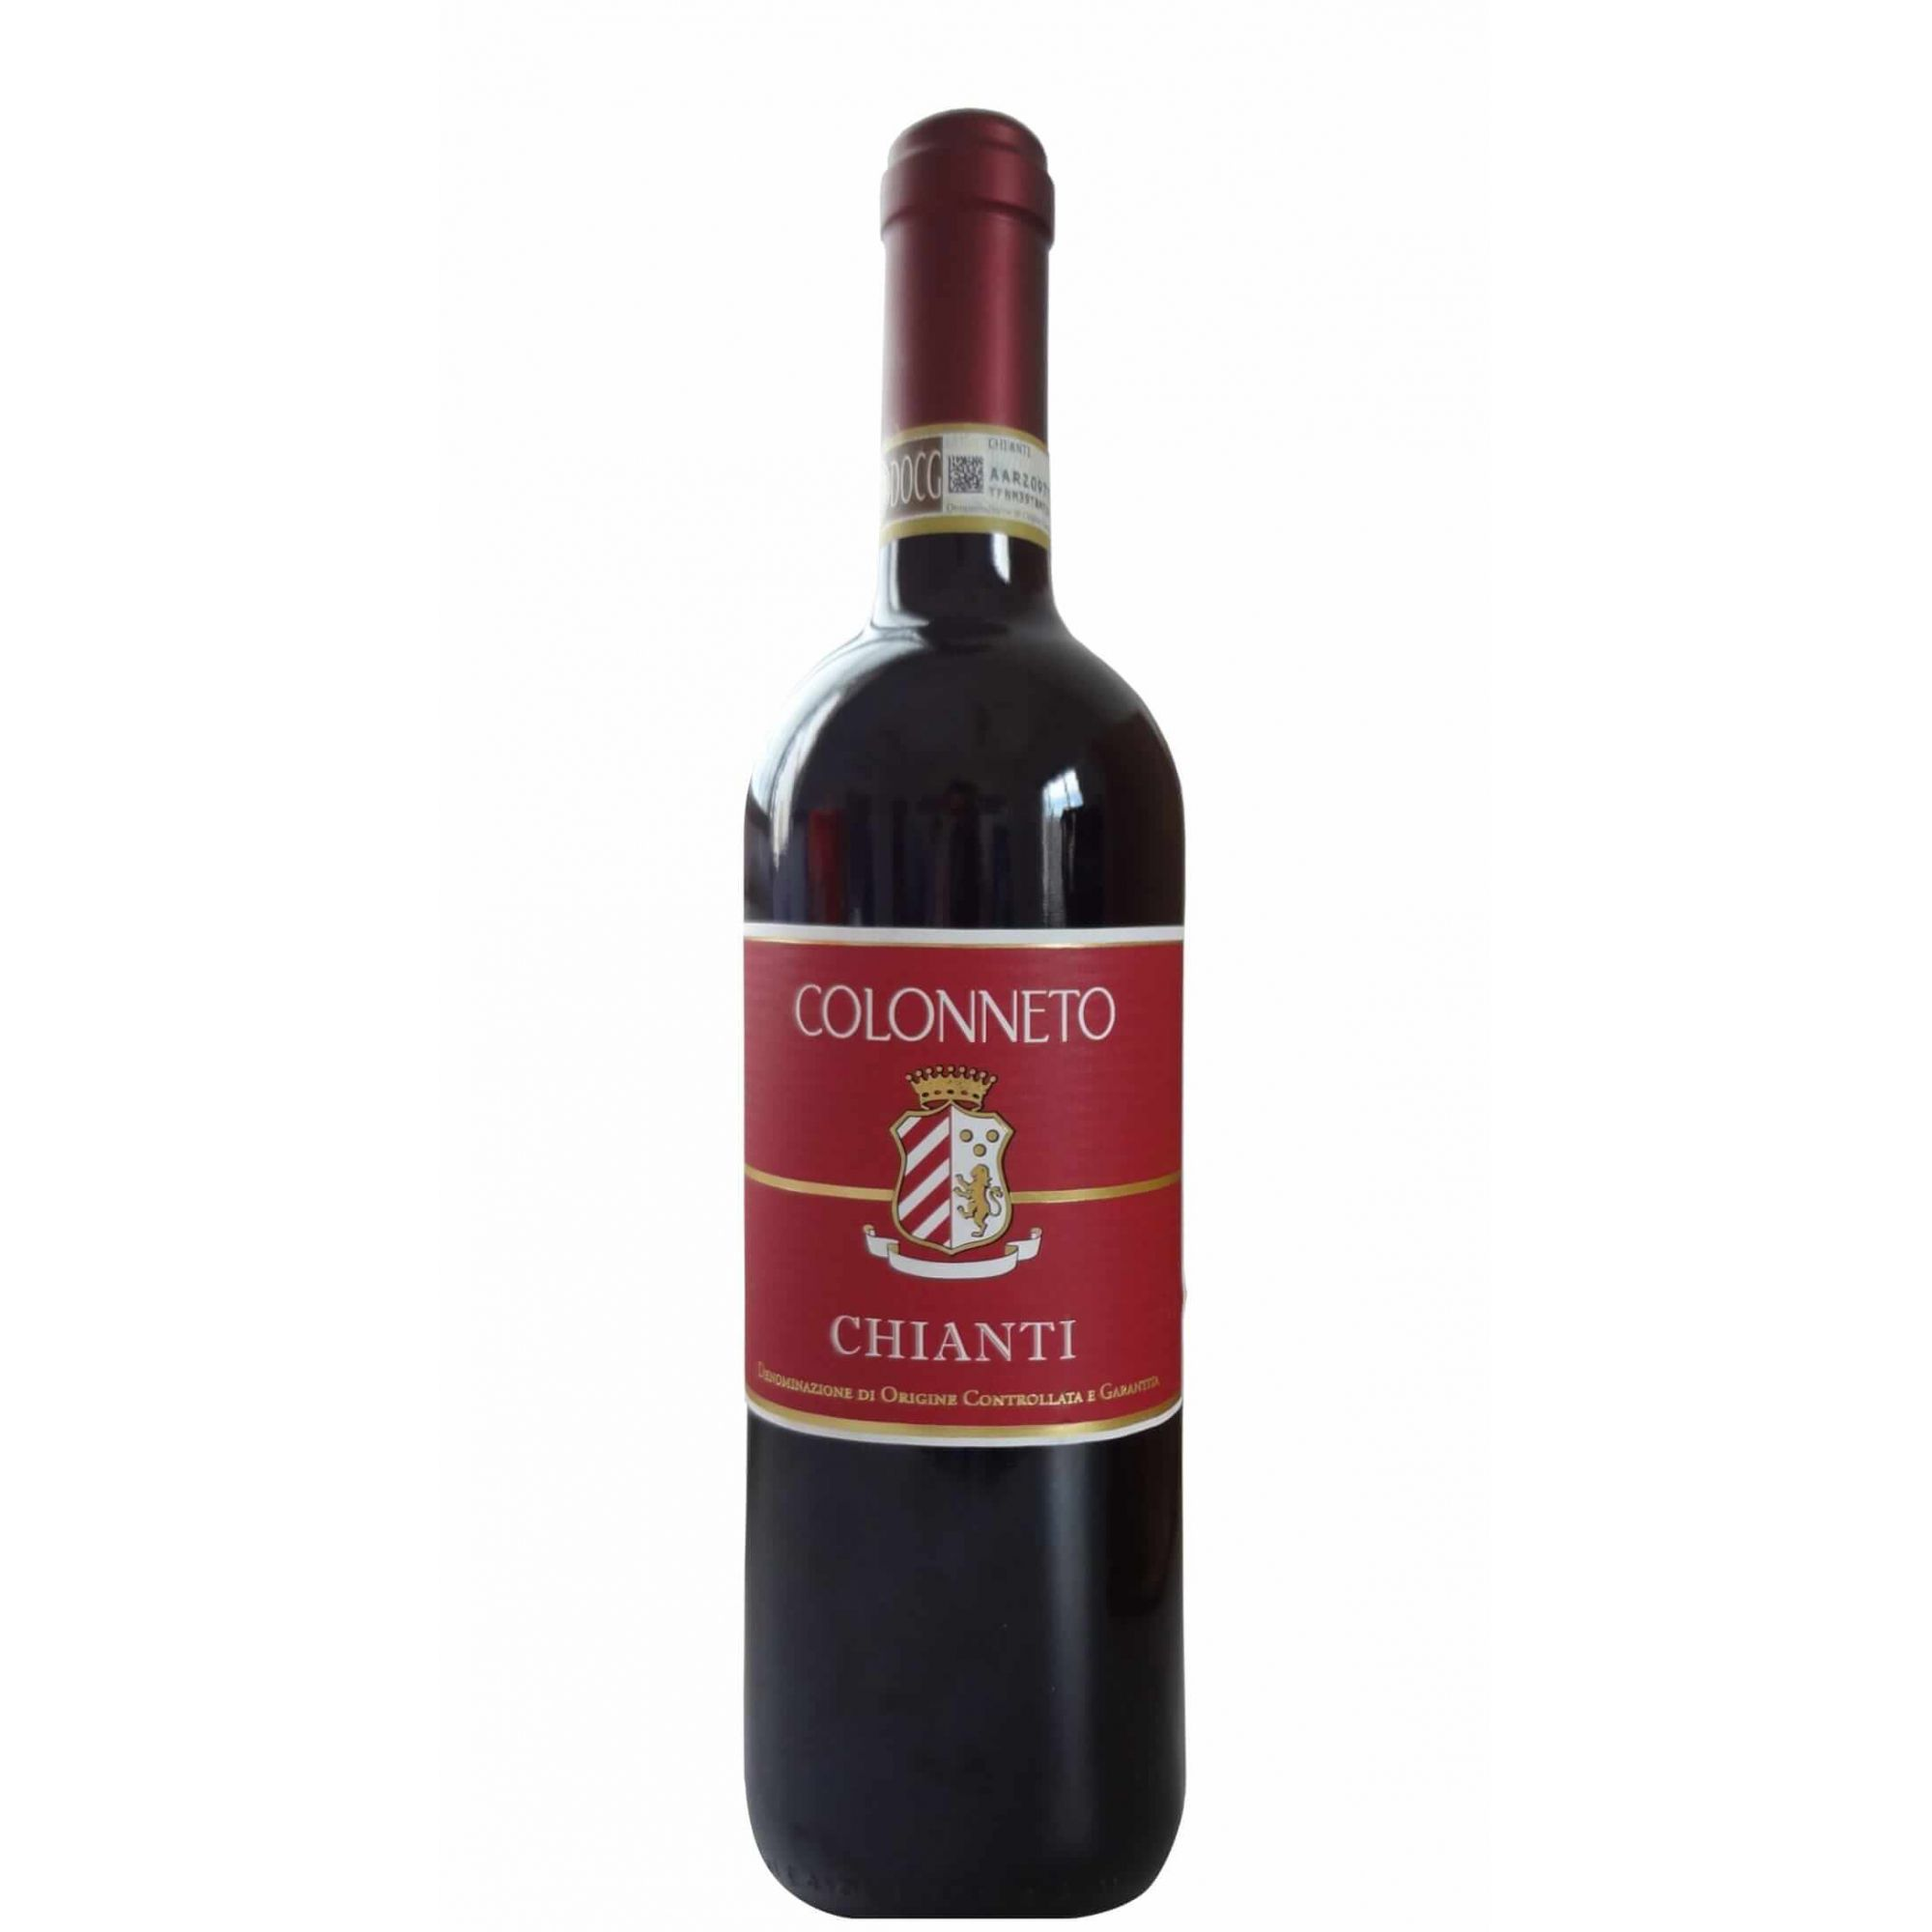 Vinho Tinto Italiano Chianti Colonneto 2018